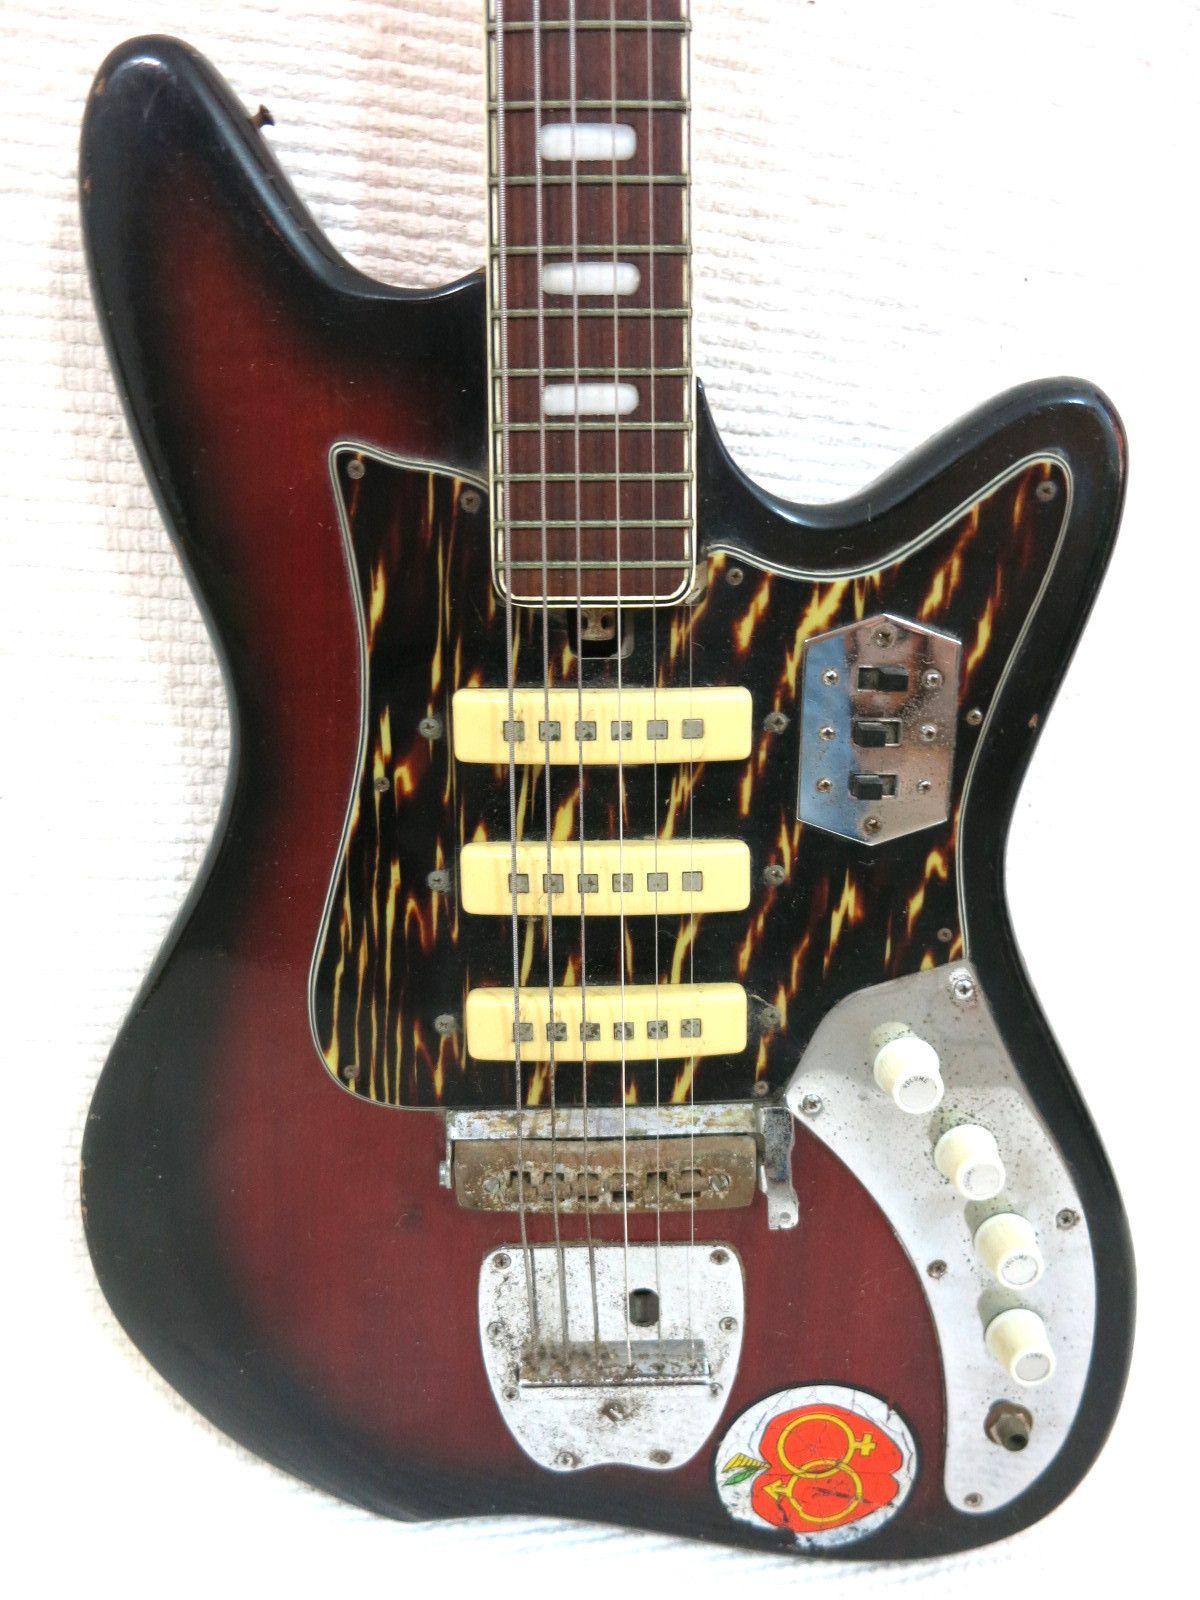 vintage 1960s teisco kawai guitar reburst version hound dog taylor lo fi rocker teisco. Black Bedroom Furniture Sets. Home Design Ideas